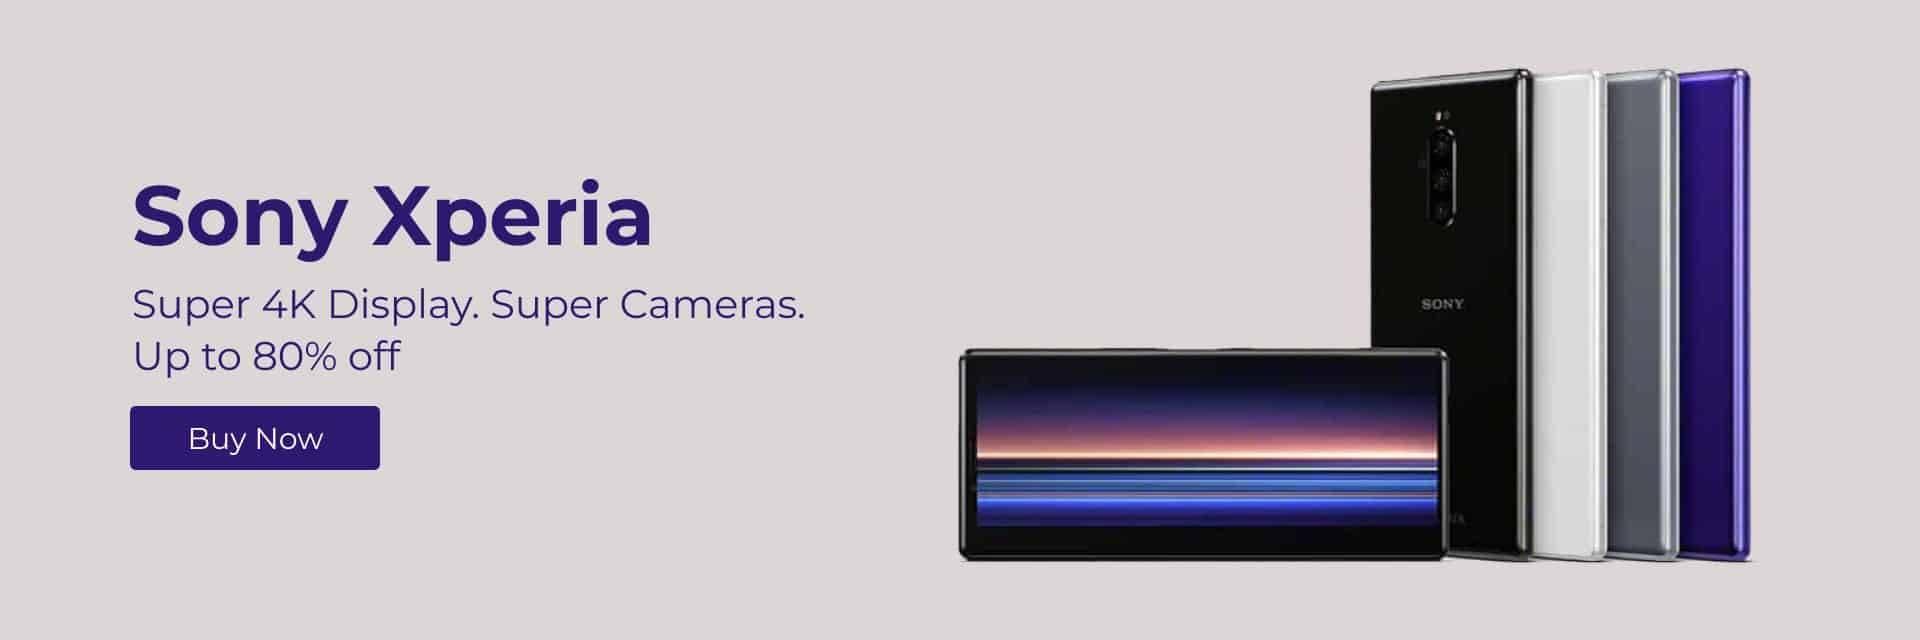 Ola Tech Sony Mobile Super 4K Display Super Cameras 80% Off